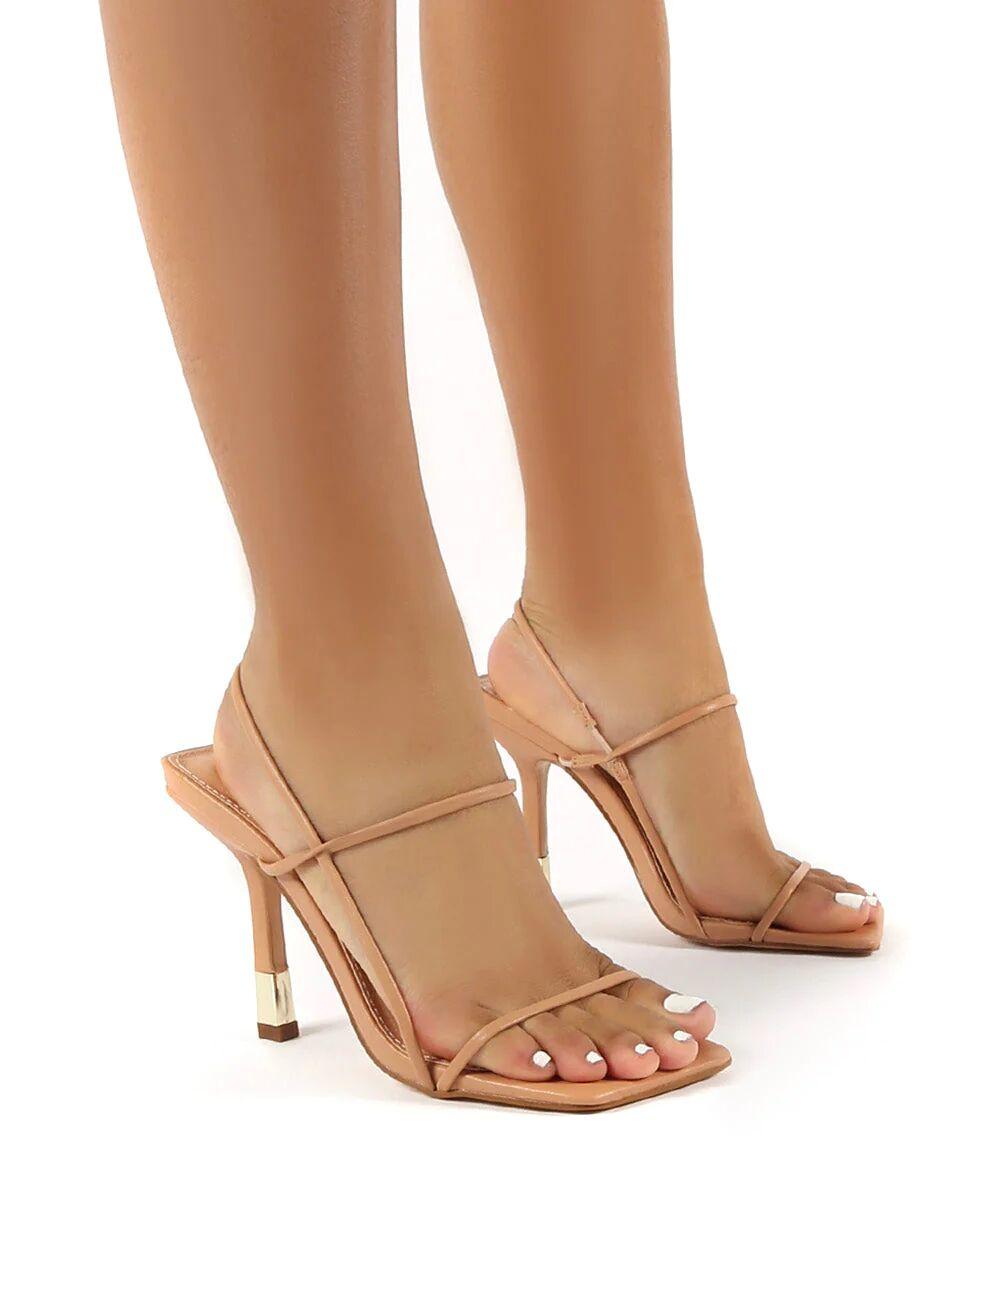 Public Desire US Rayelle Nude Square Toe Strappy Gold Heels - US 8